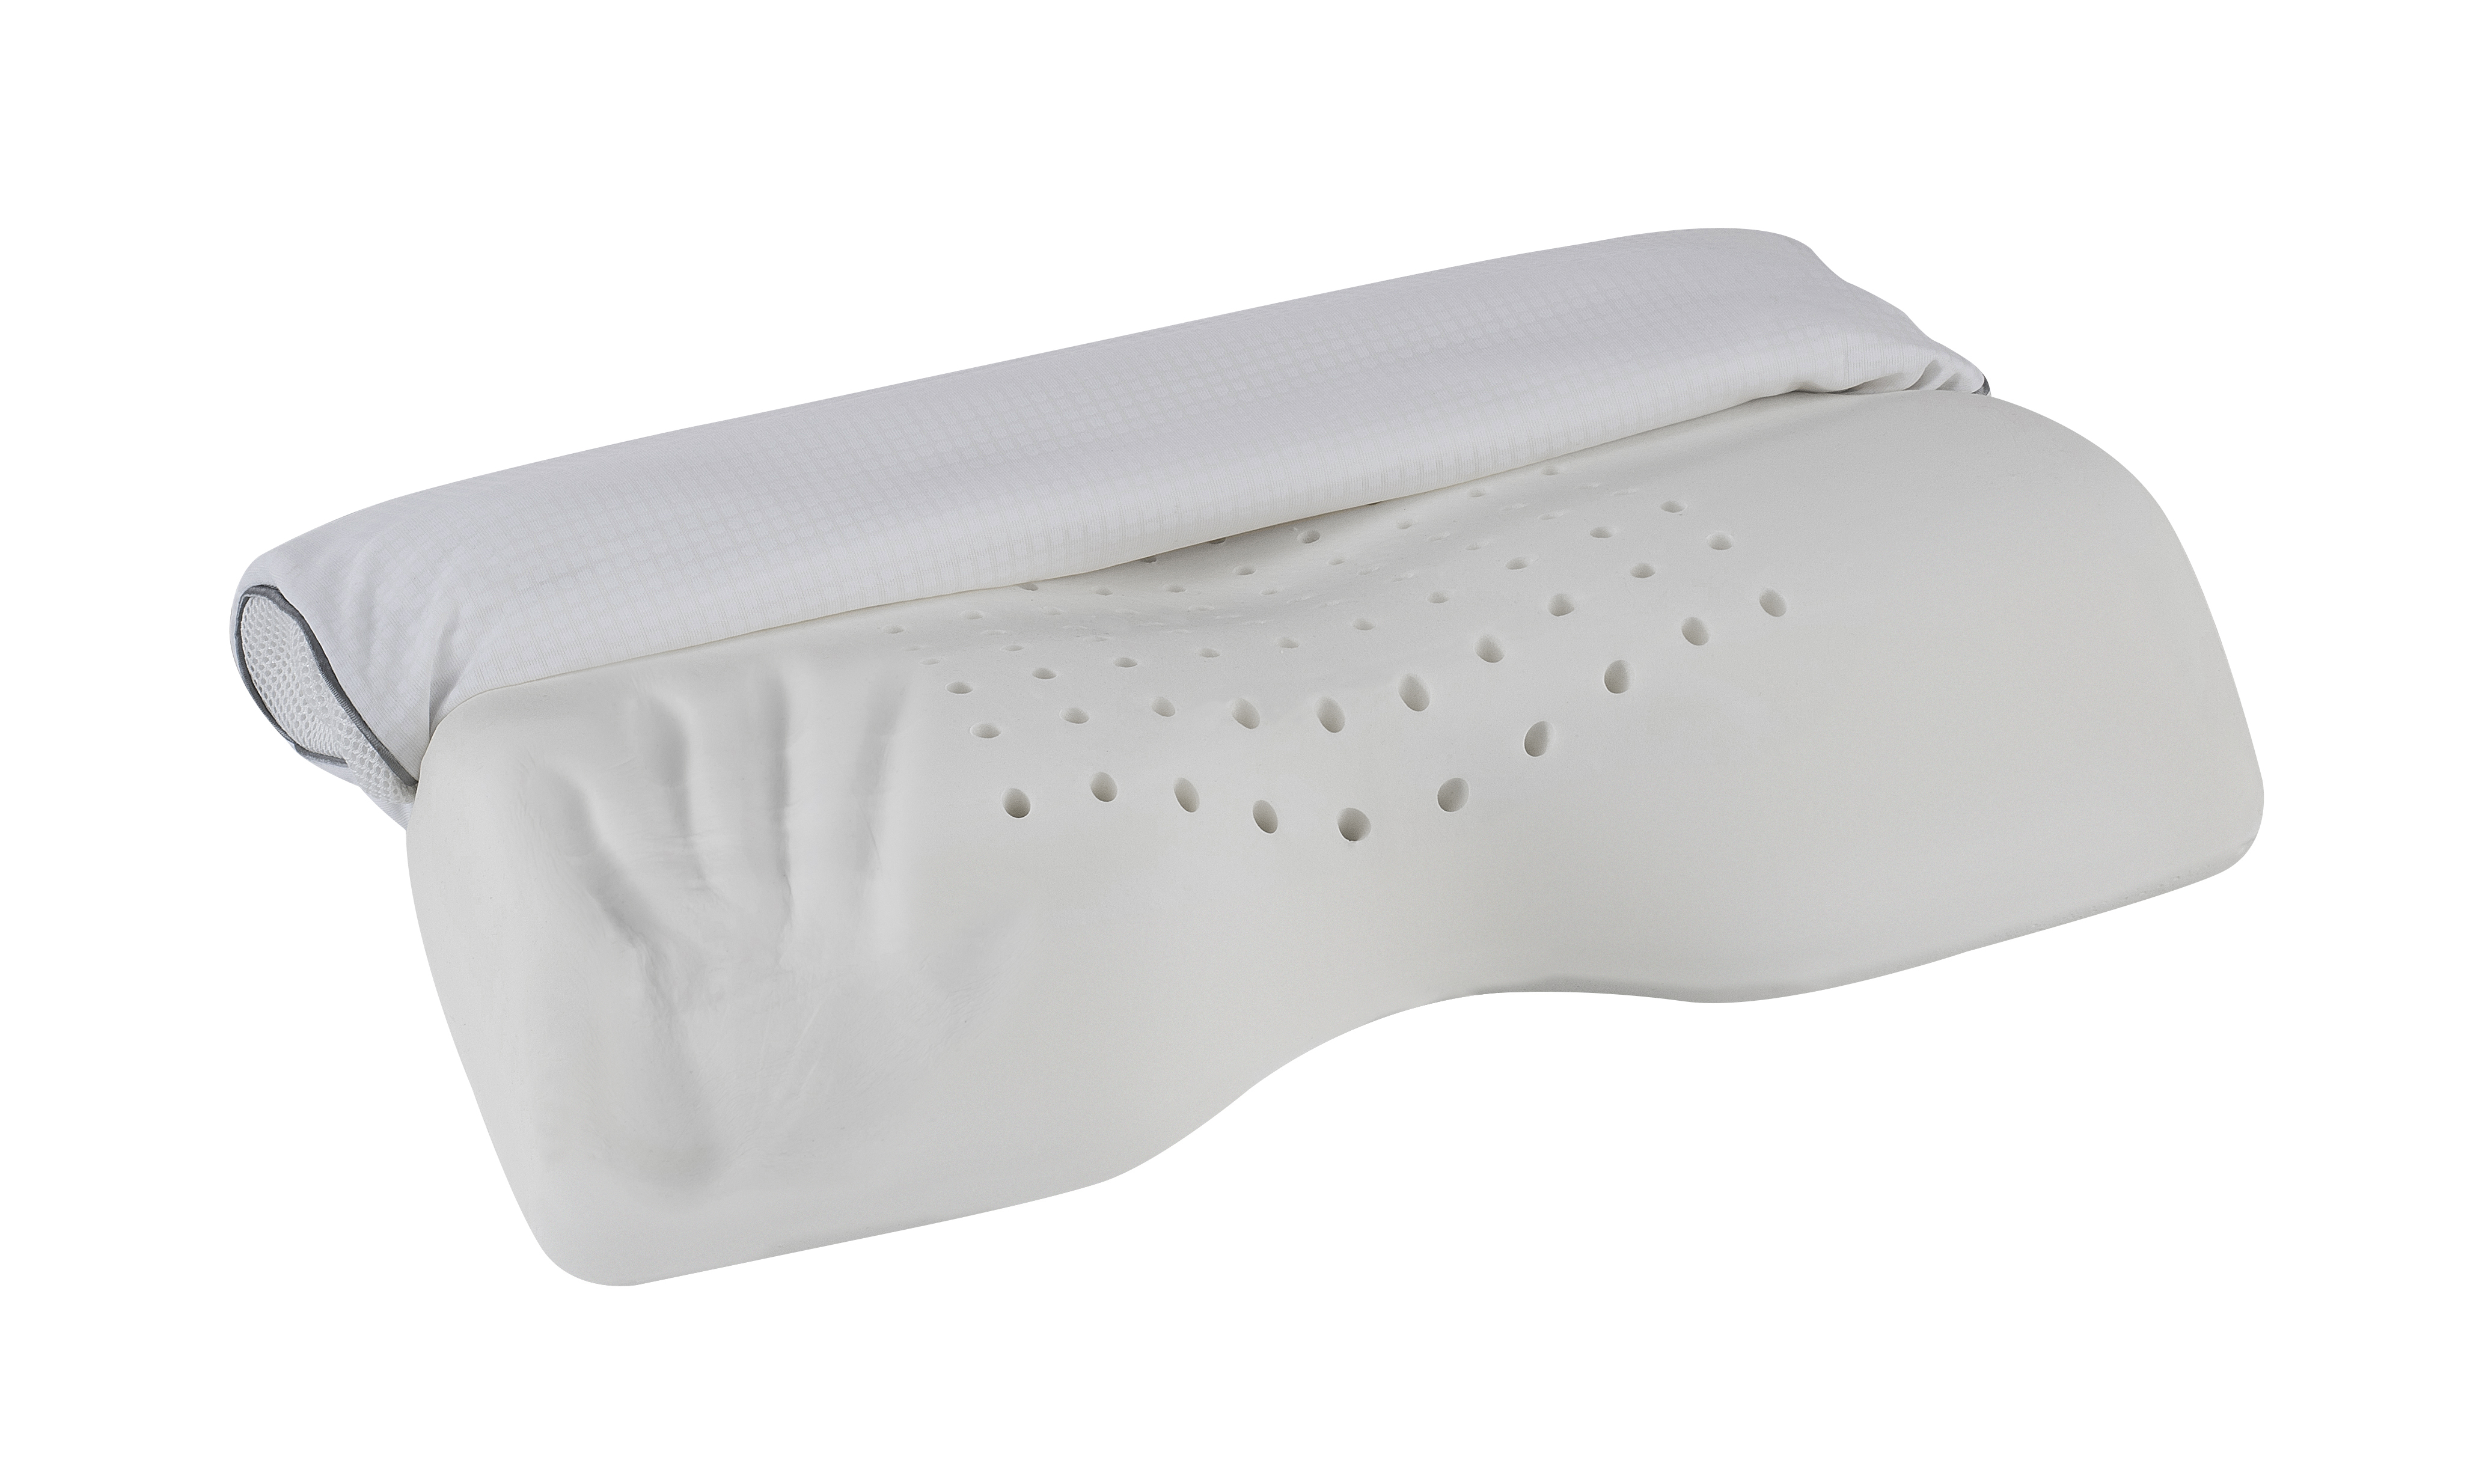 Подушка Magniflex Memoform Superiore Comfort